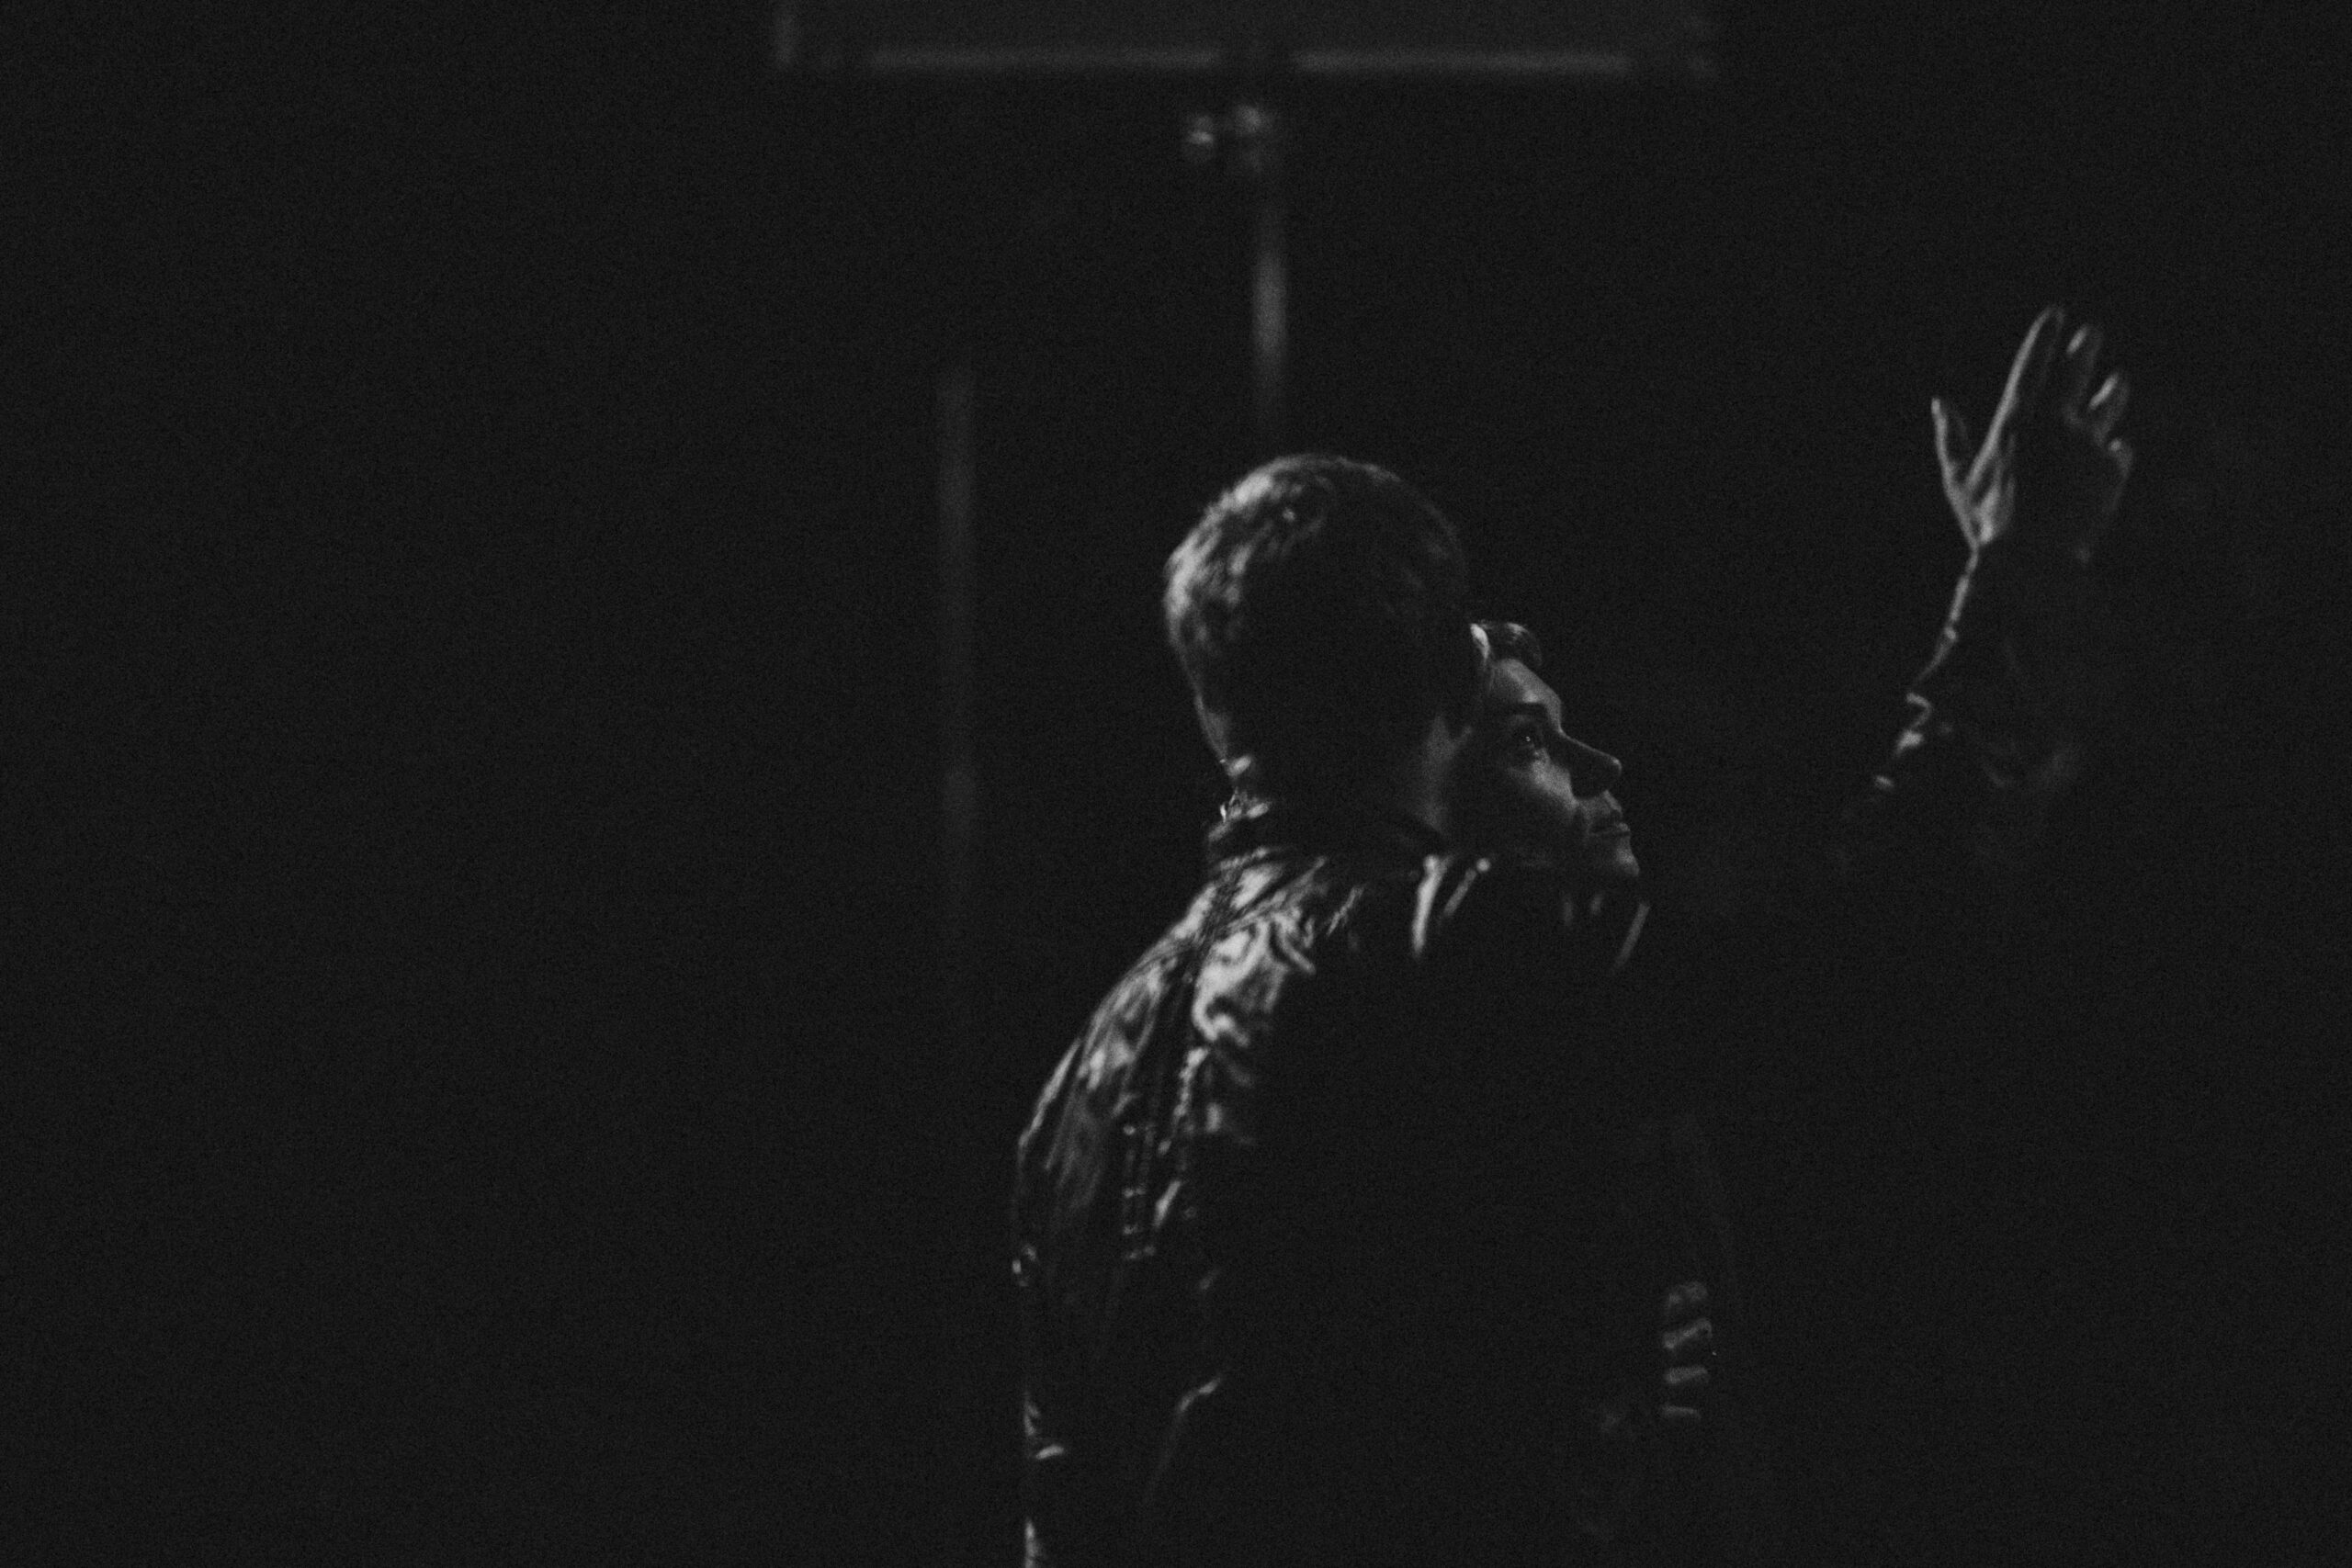 Bela Kiss Prologue BTS Film Setfotos